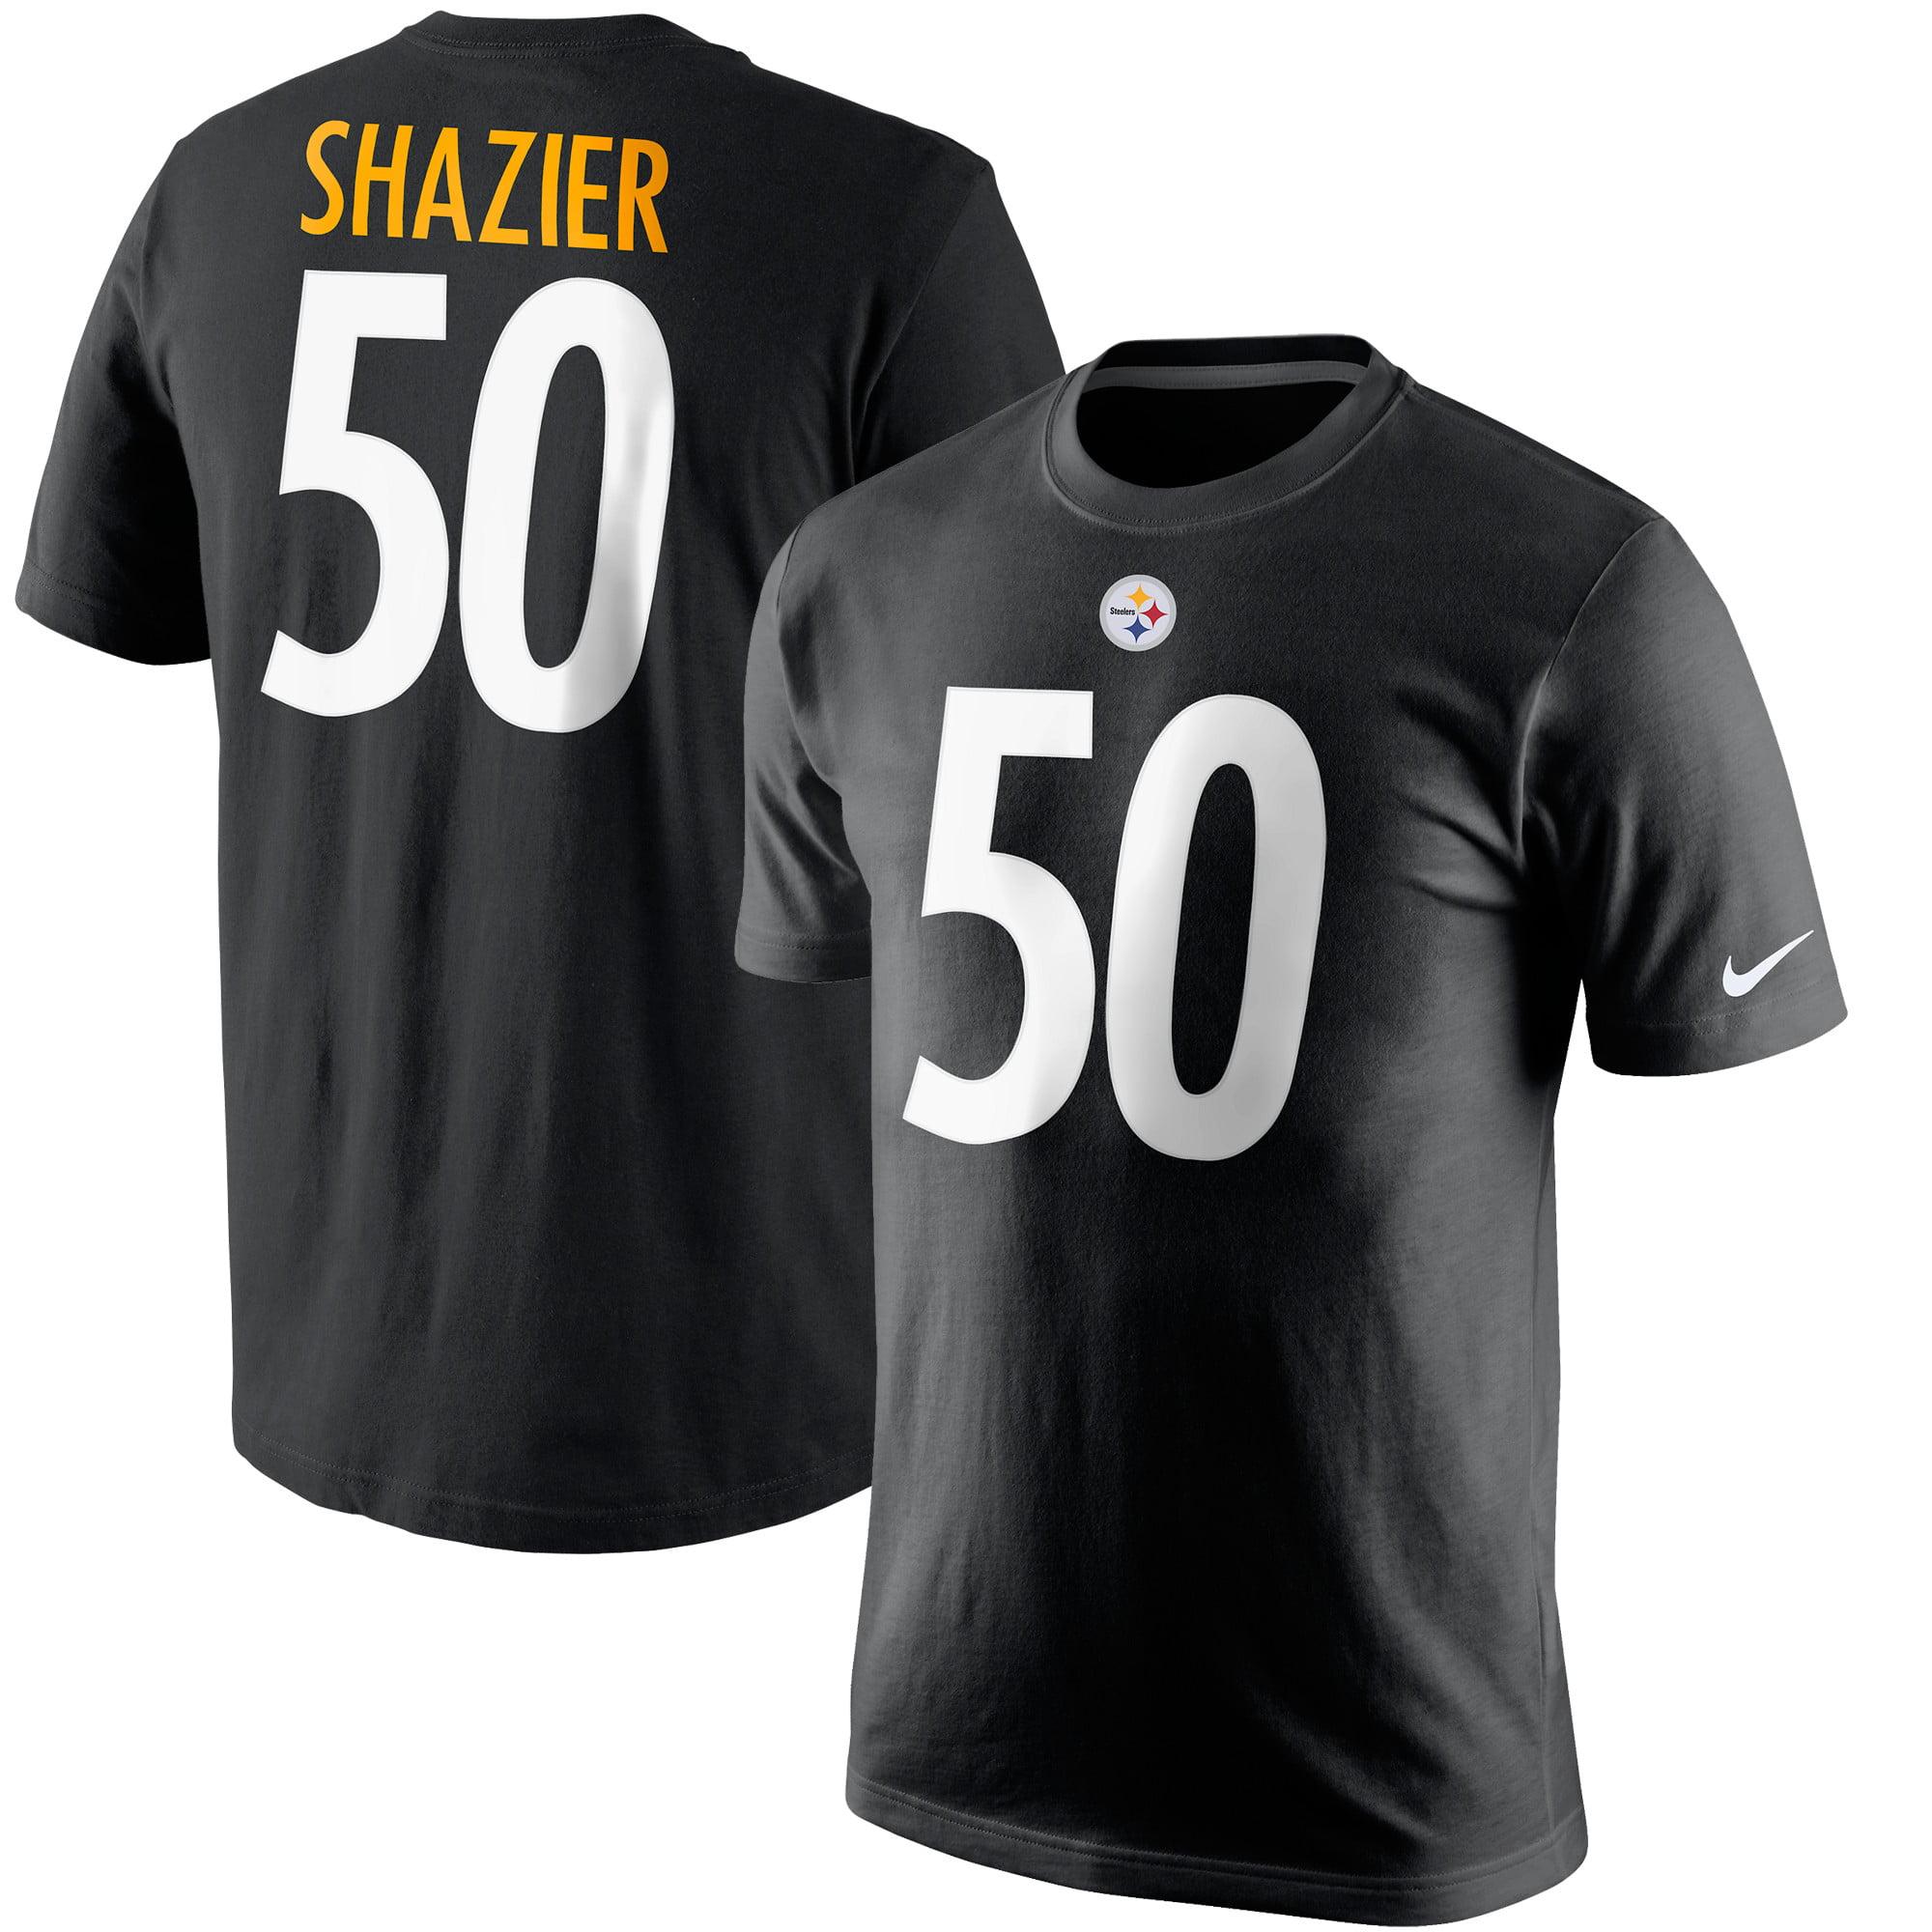 Ryan Shazier Pittsburgh Steelers Nike Player Pride Name & Number T-Shirt - Black